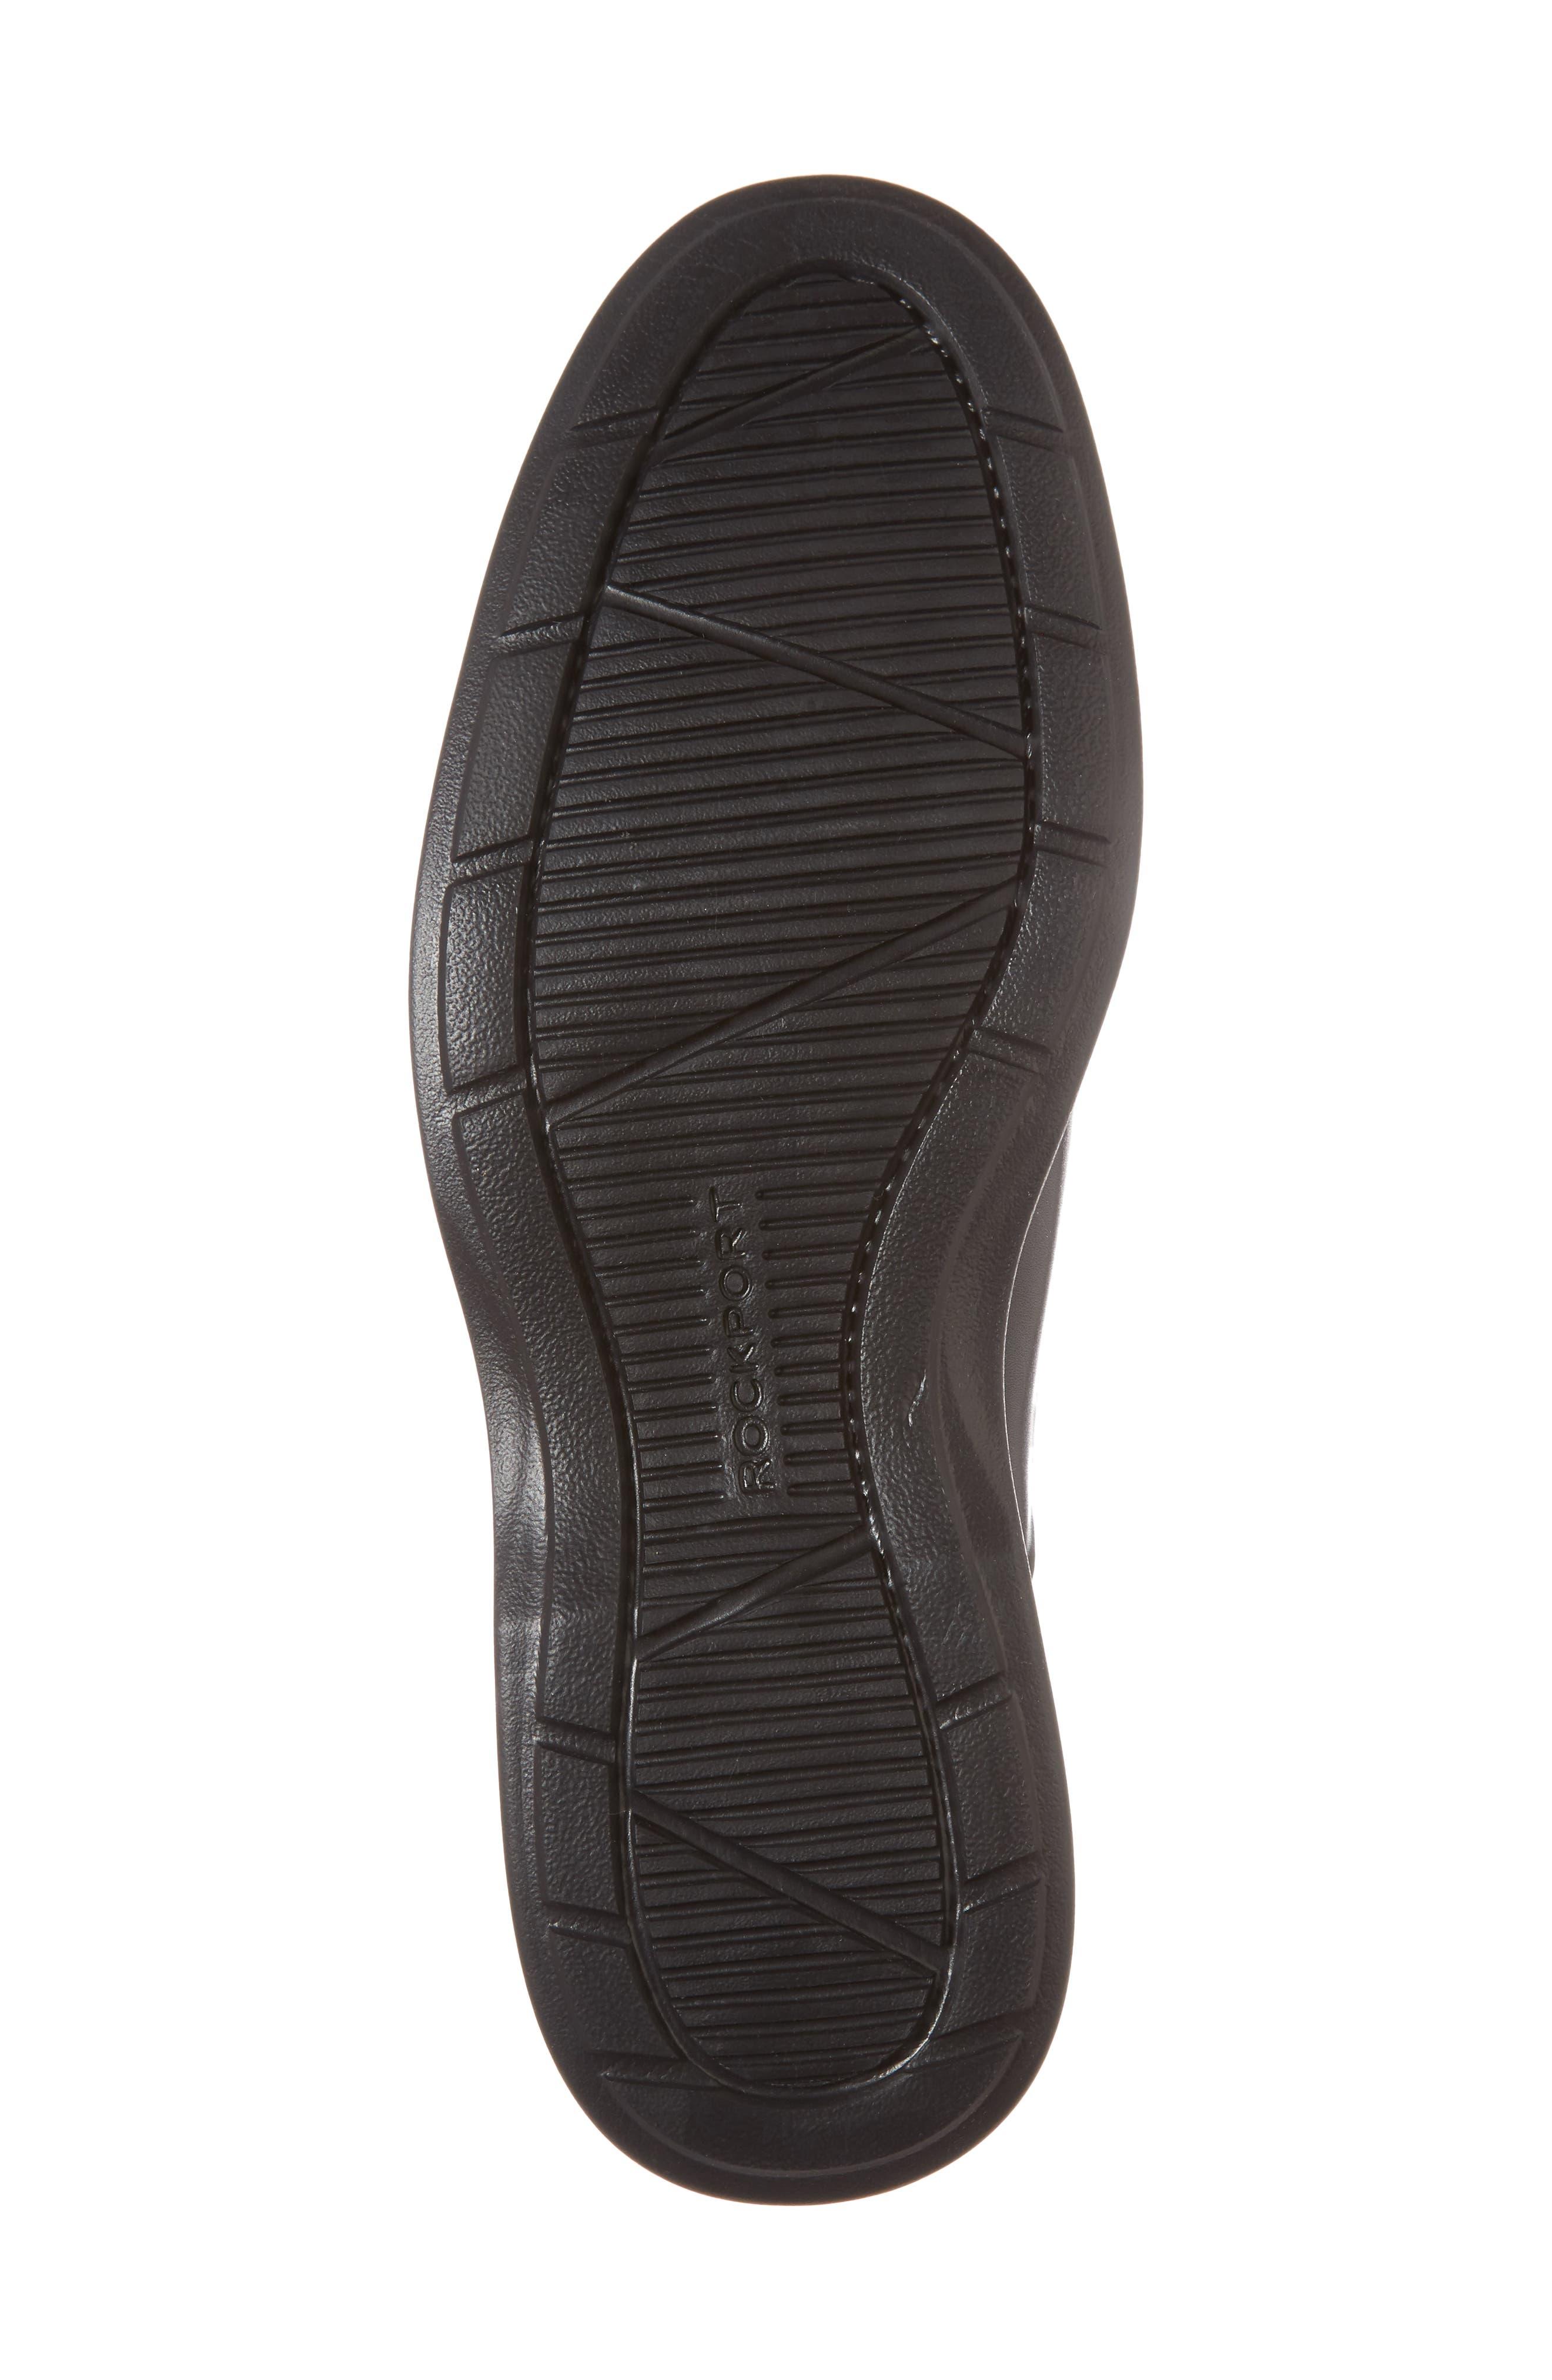 Dressports 2 Lite Venetian Loafer,                             Alternate thumbnail 6, color,                             Black Leather